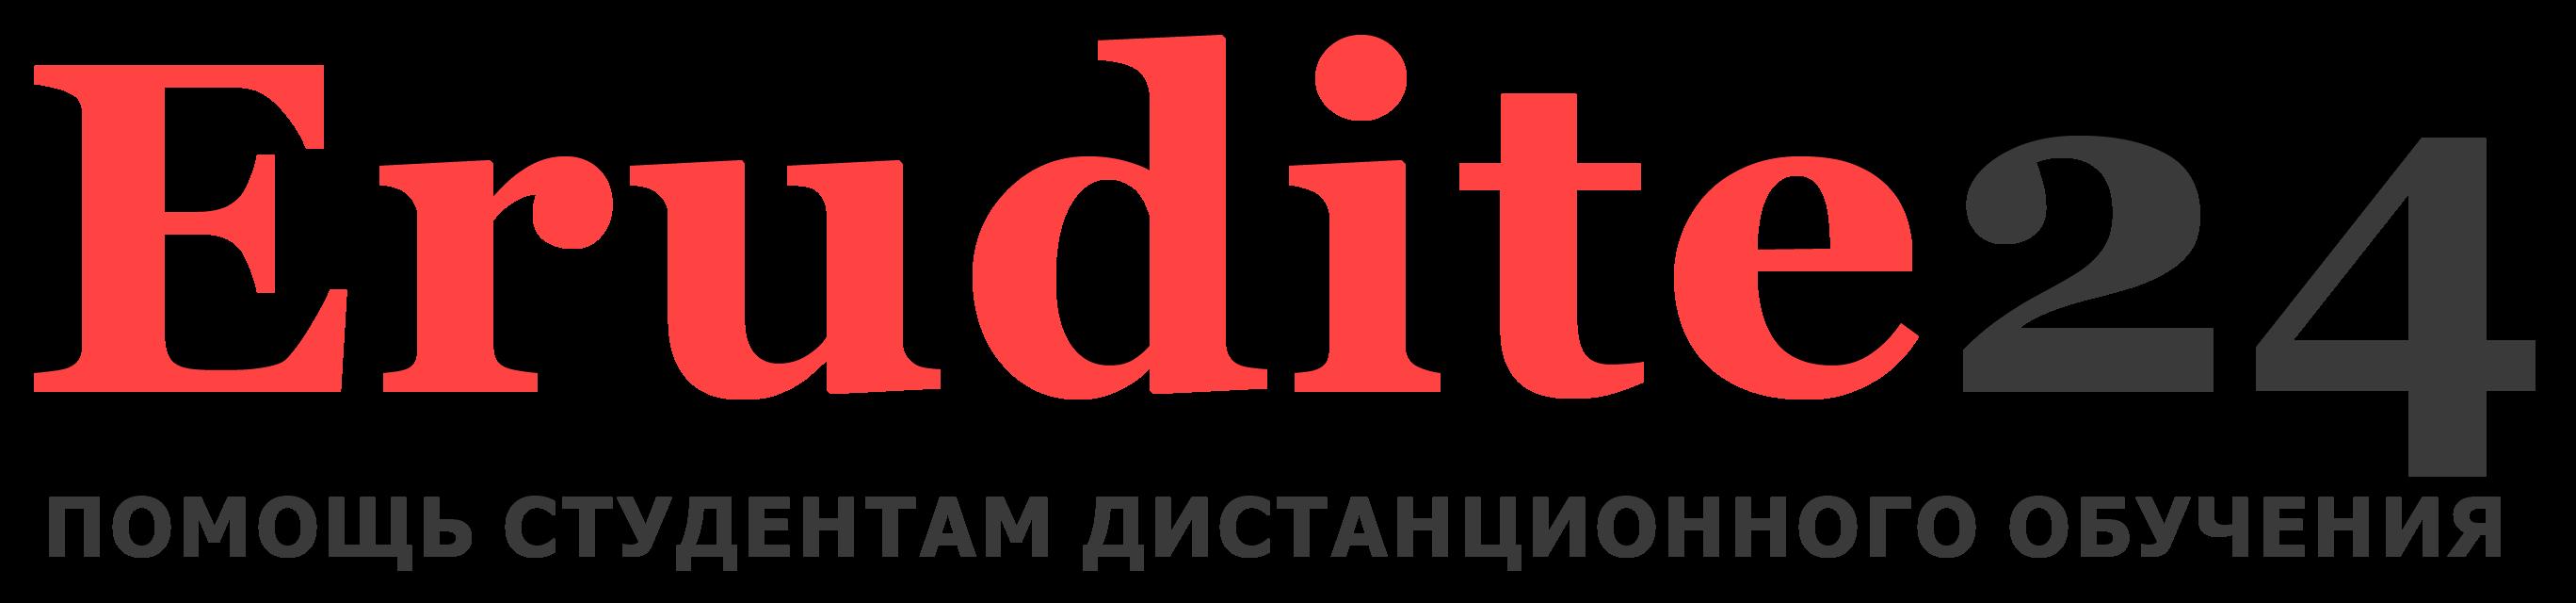 Эрудит24